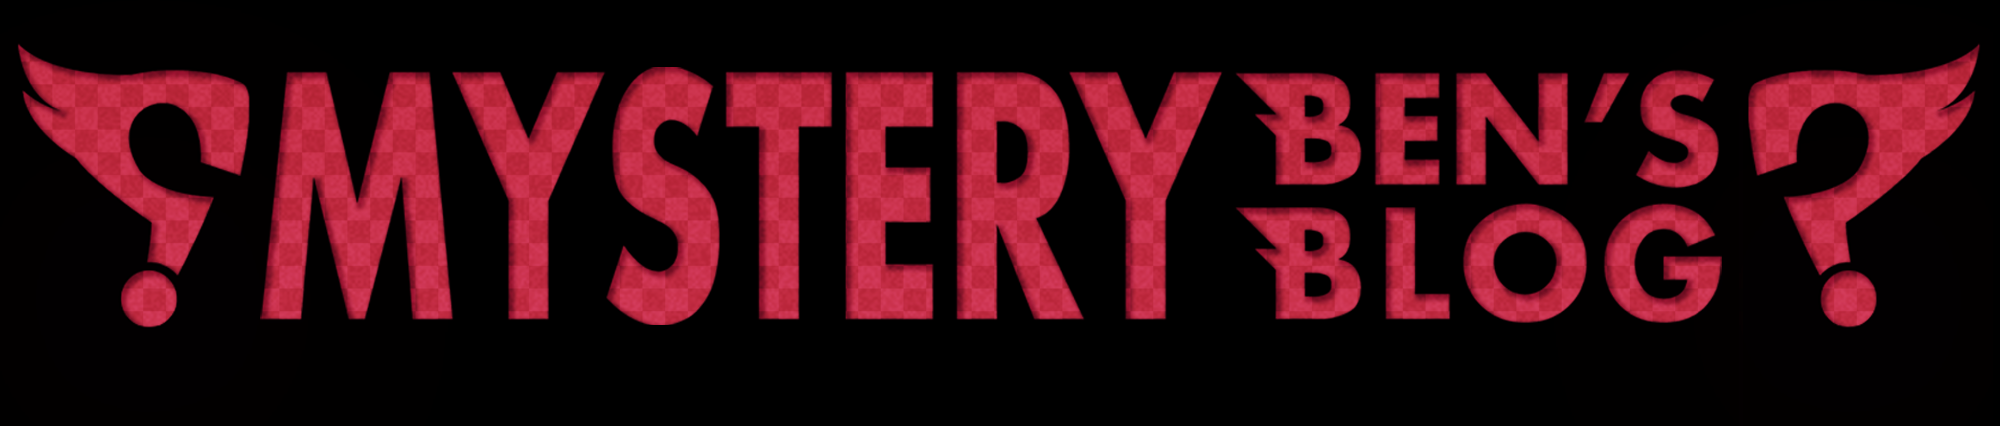 Mystery Ben's Mystery Blog